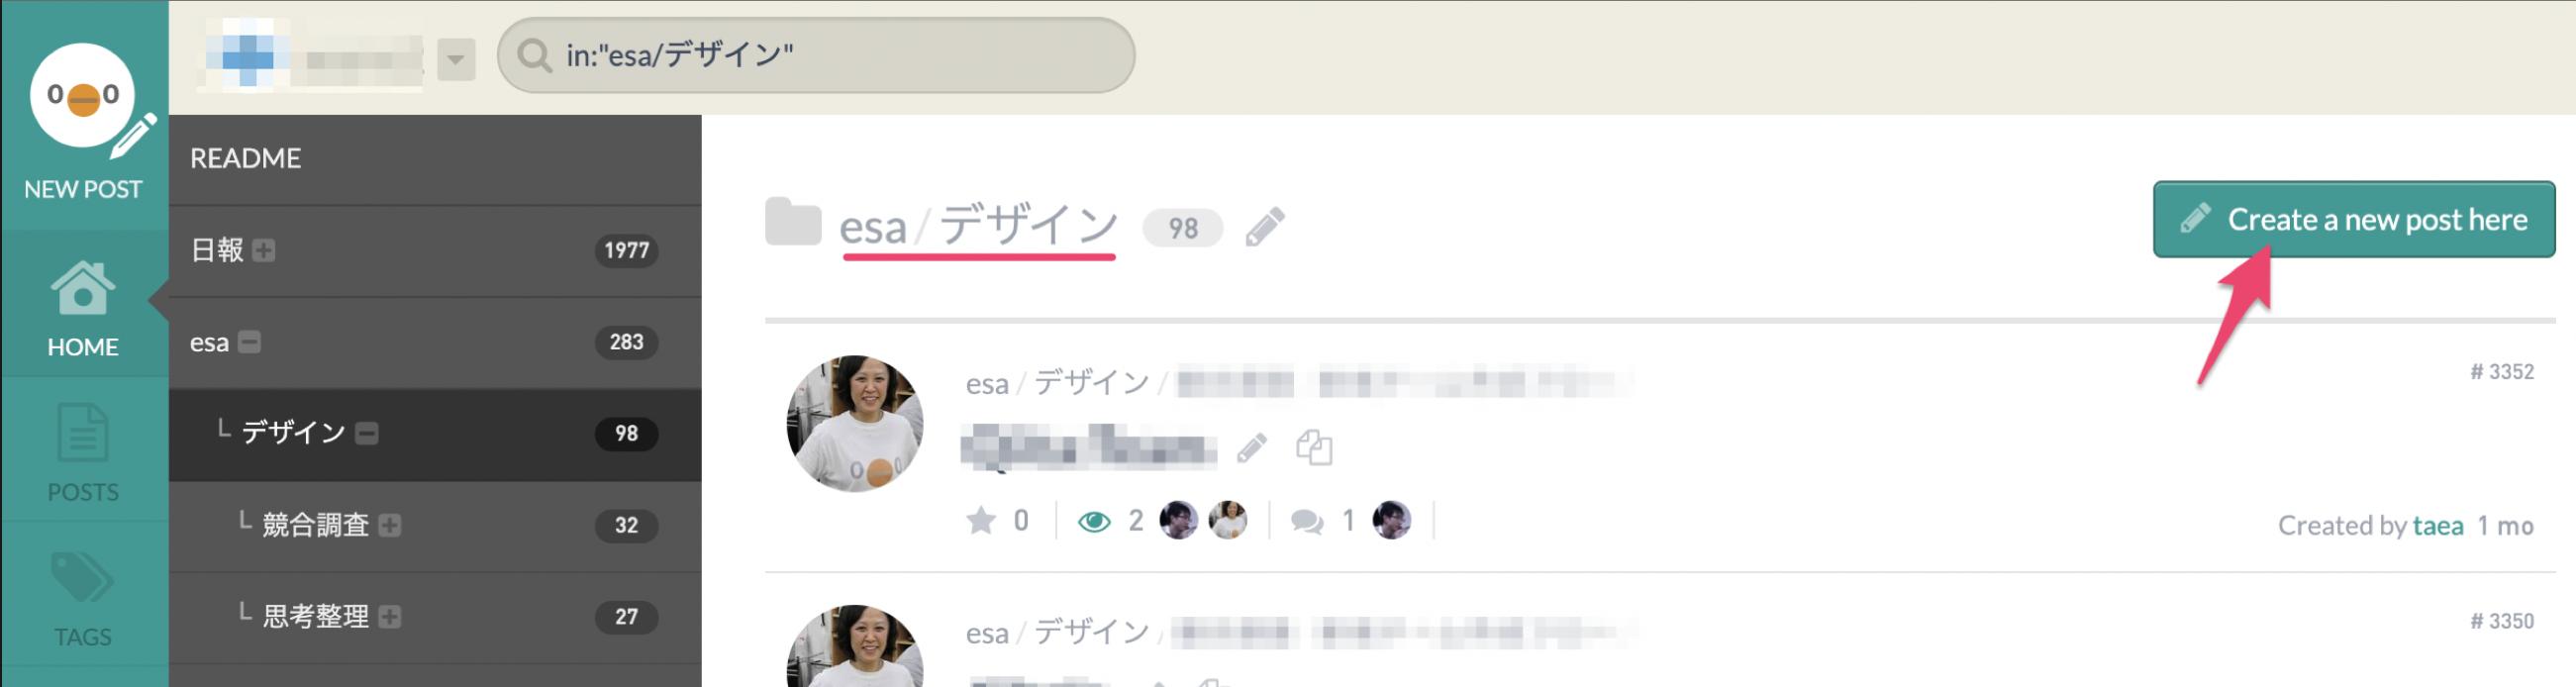 image.png (2.3 MB)